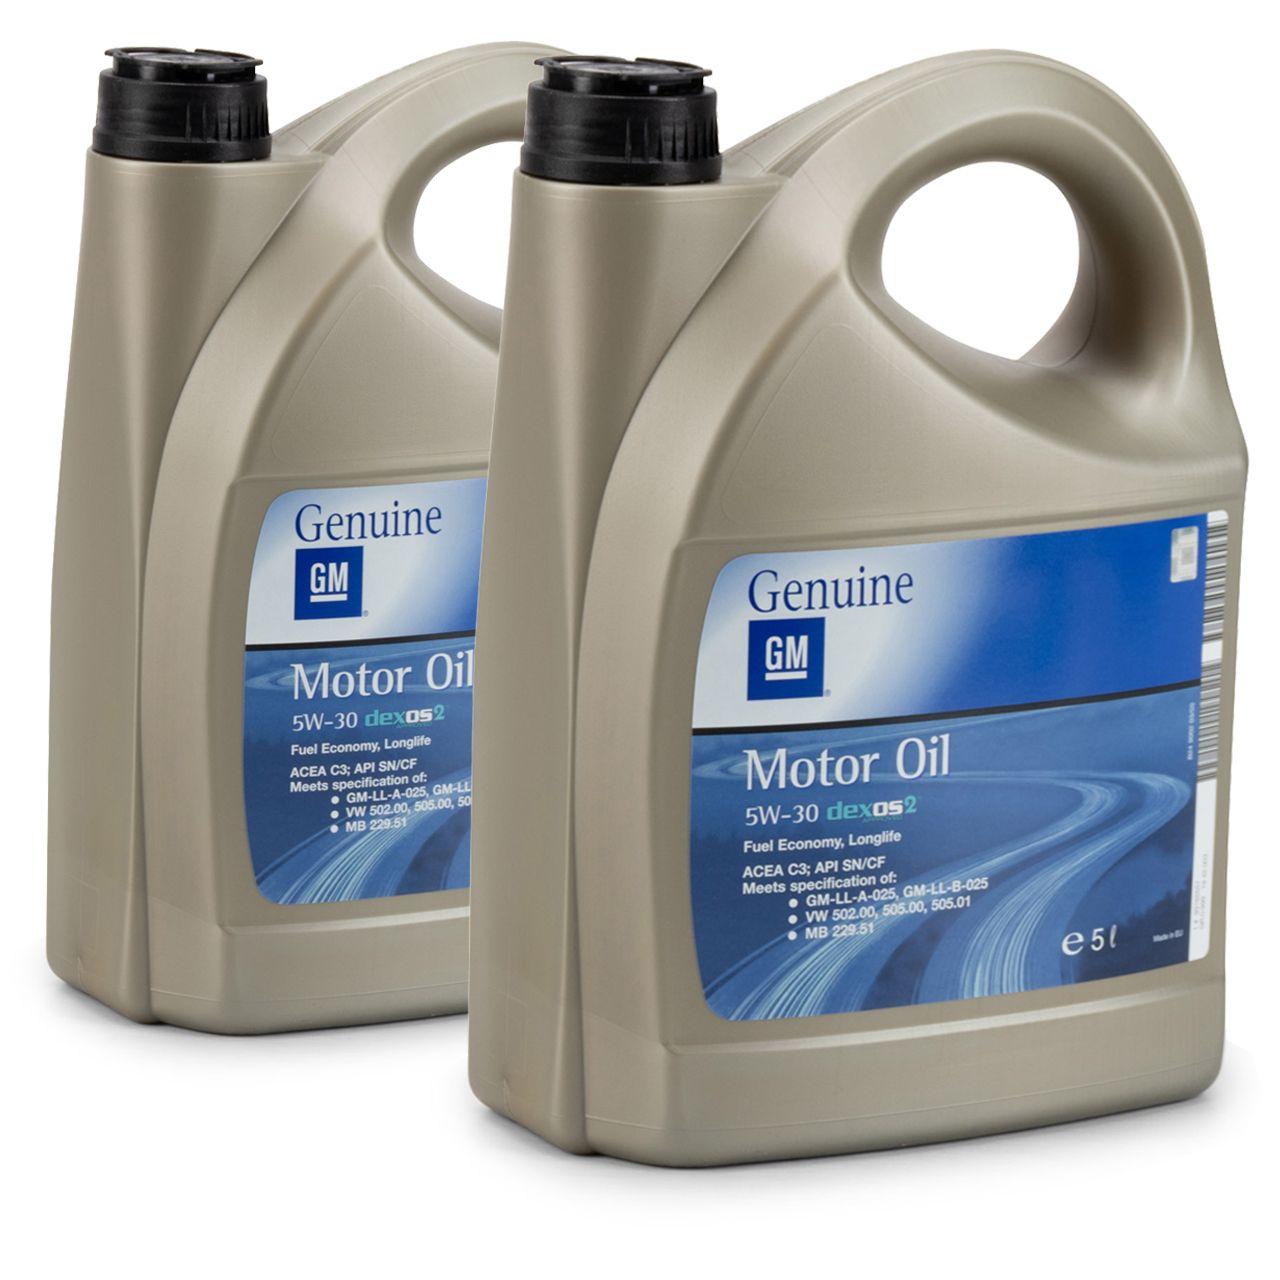 10 Liter = 2x5 ORIGINAL OPEL GM MOTORÖL 5W-30 dexos2 Longlife 5W30 ÖL - 1942003